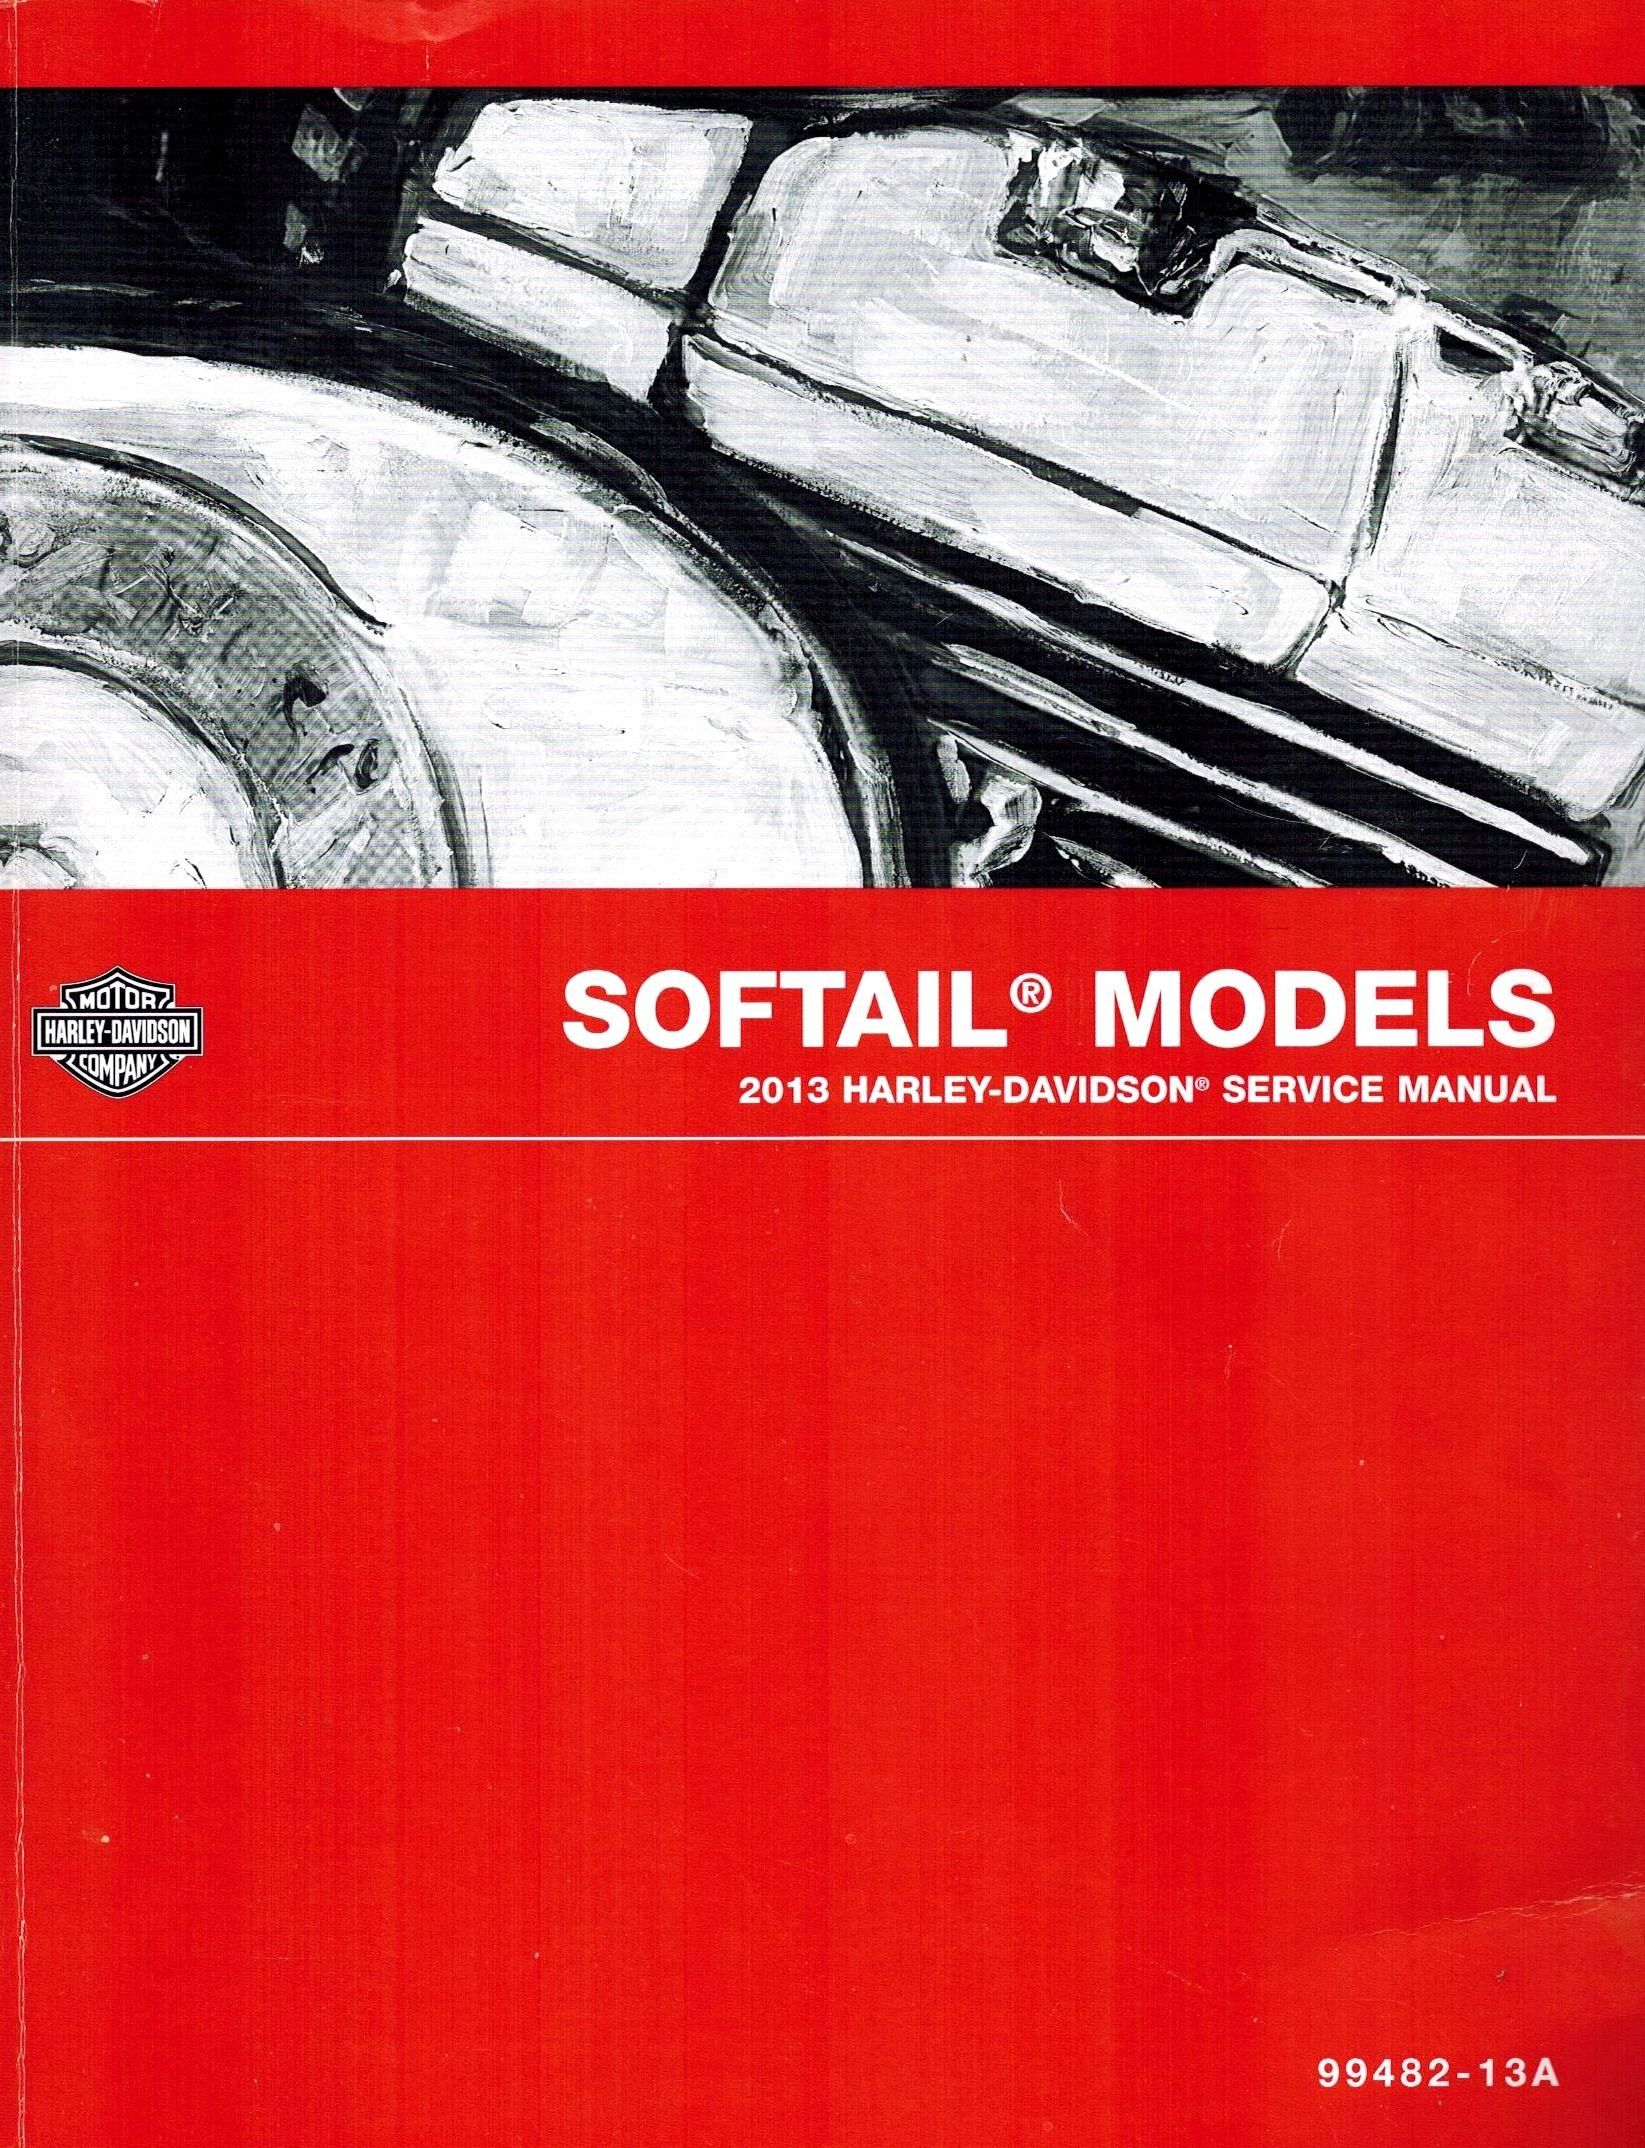 2013 Harley Davidson Softail Model Service Shop Repair Manual In 2020 Harley Davidson Repair Manuals Softail